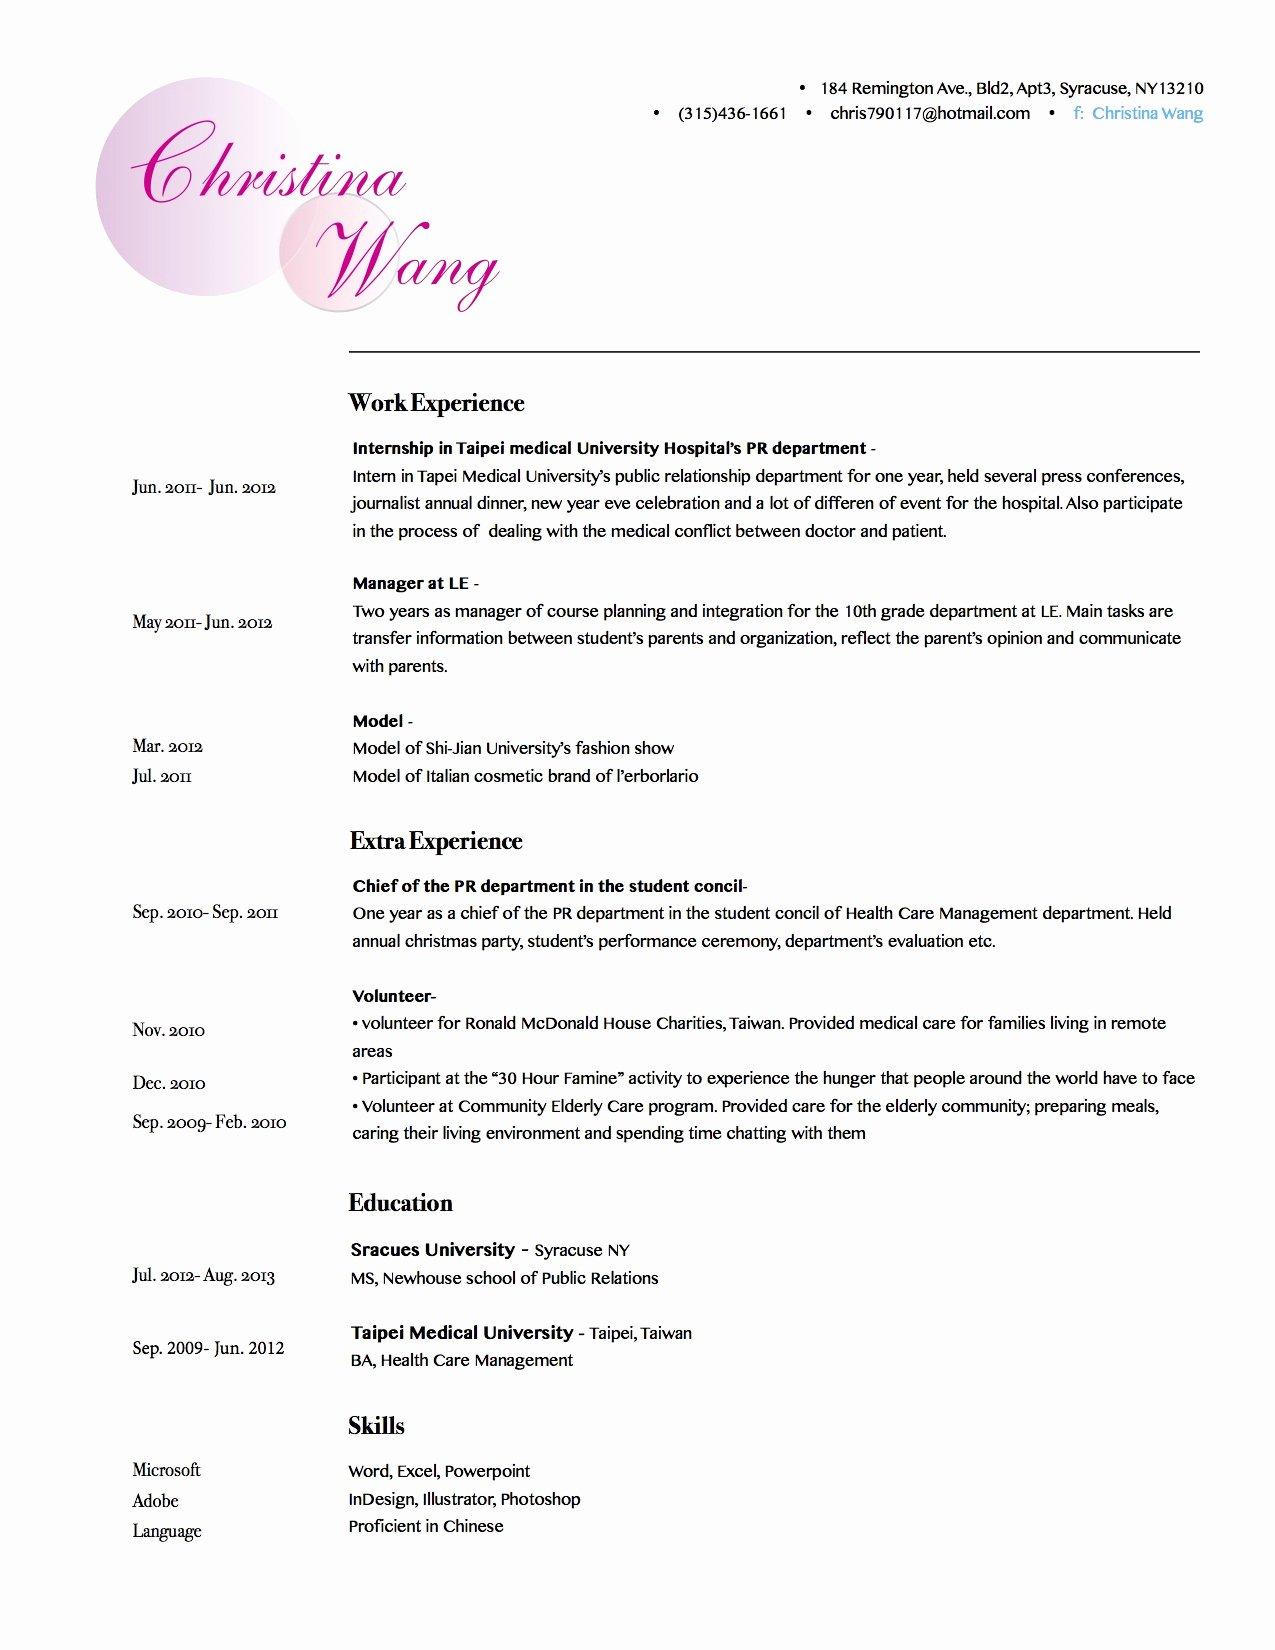 Freelance Makeup Artist Resume